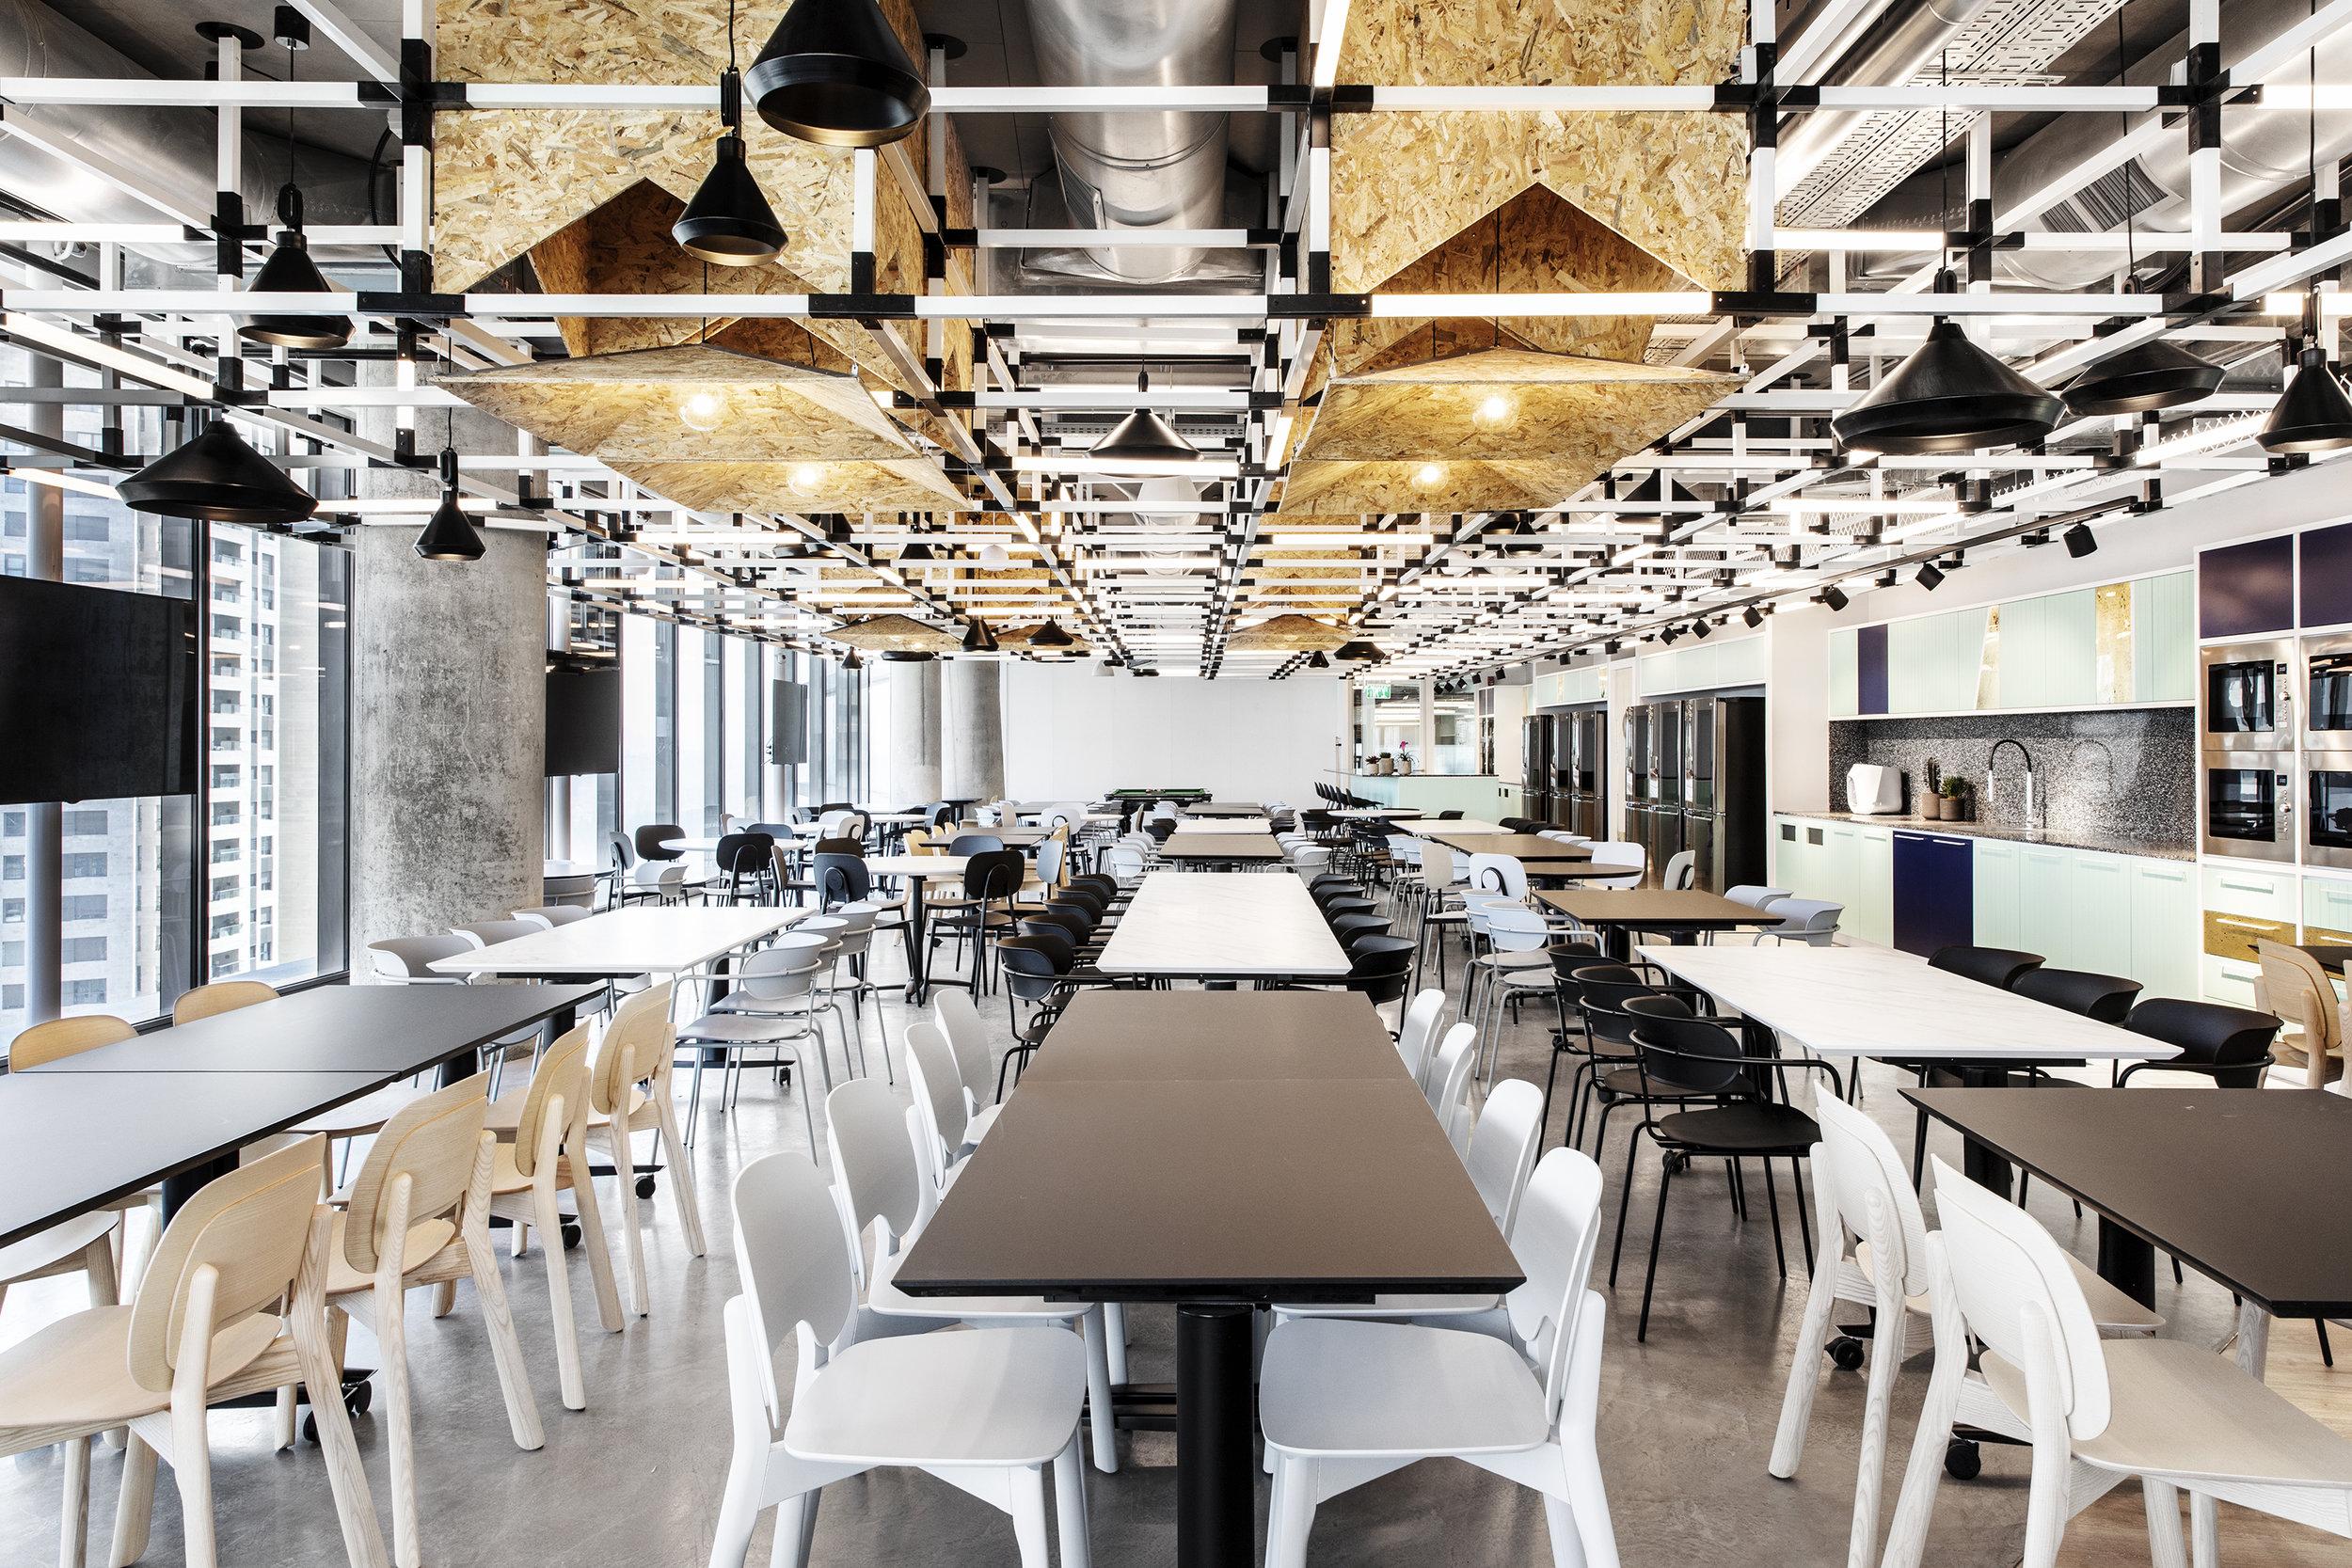 רואי דוד אדריכלות - אדריכל - נטורל אינטליג'נס - ROY DAVID - ARCHITECTURE - ARCHITECT - NI (6).jpg